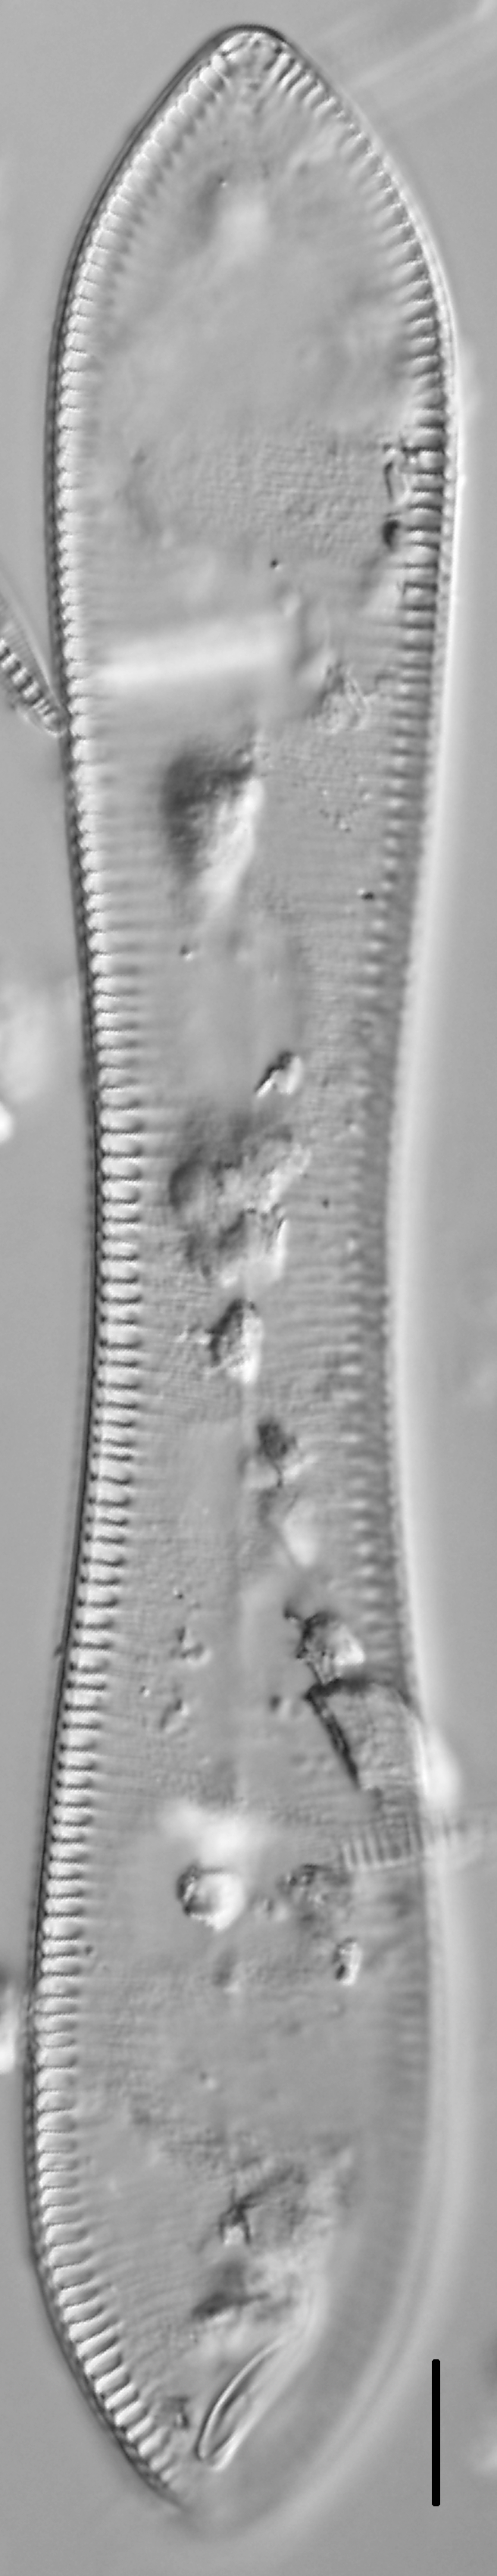 Cymatopleura solea LM1